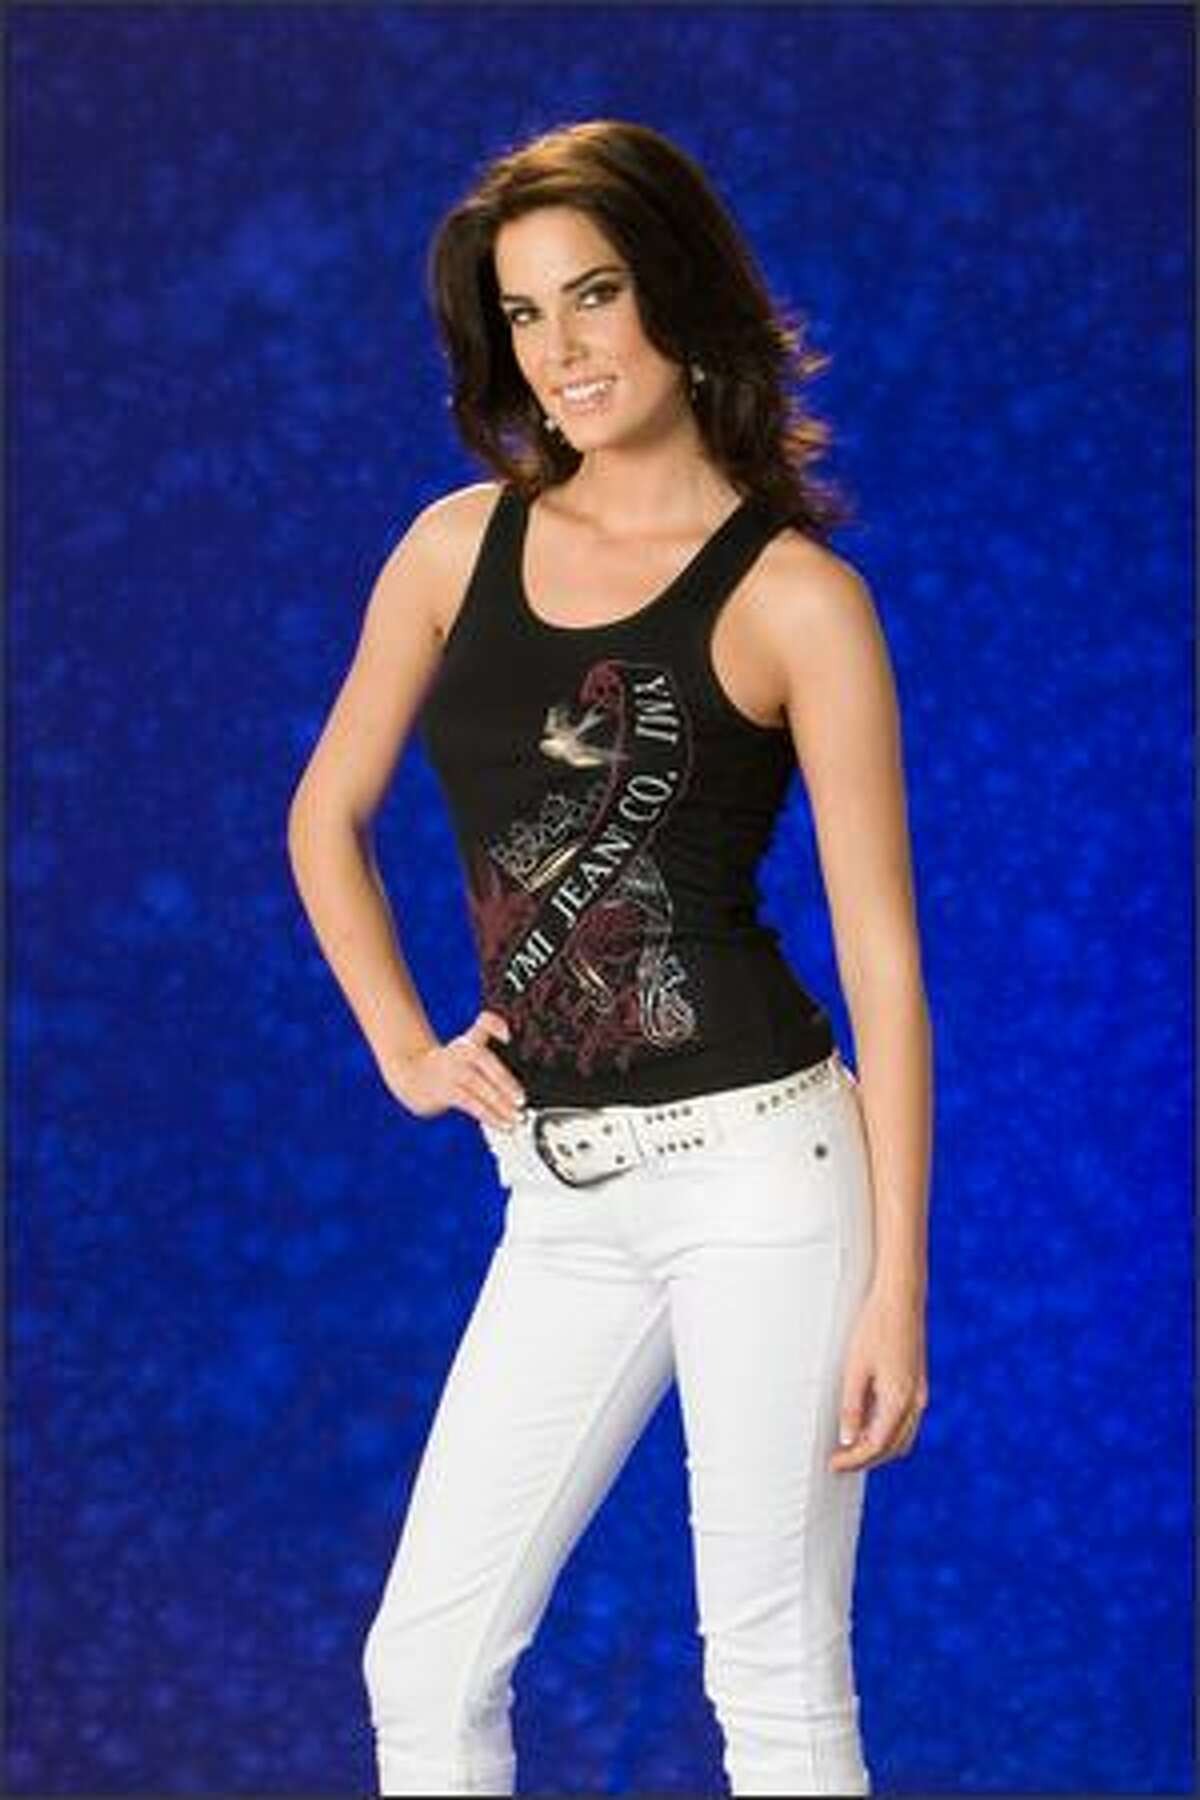 Natalia Zabala Arroyo, Miss Spain 2007.